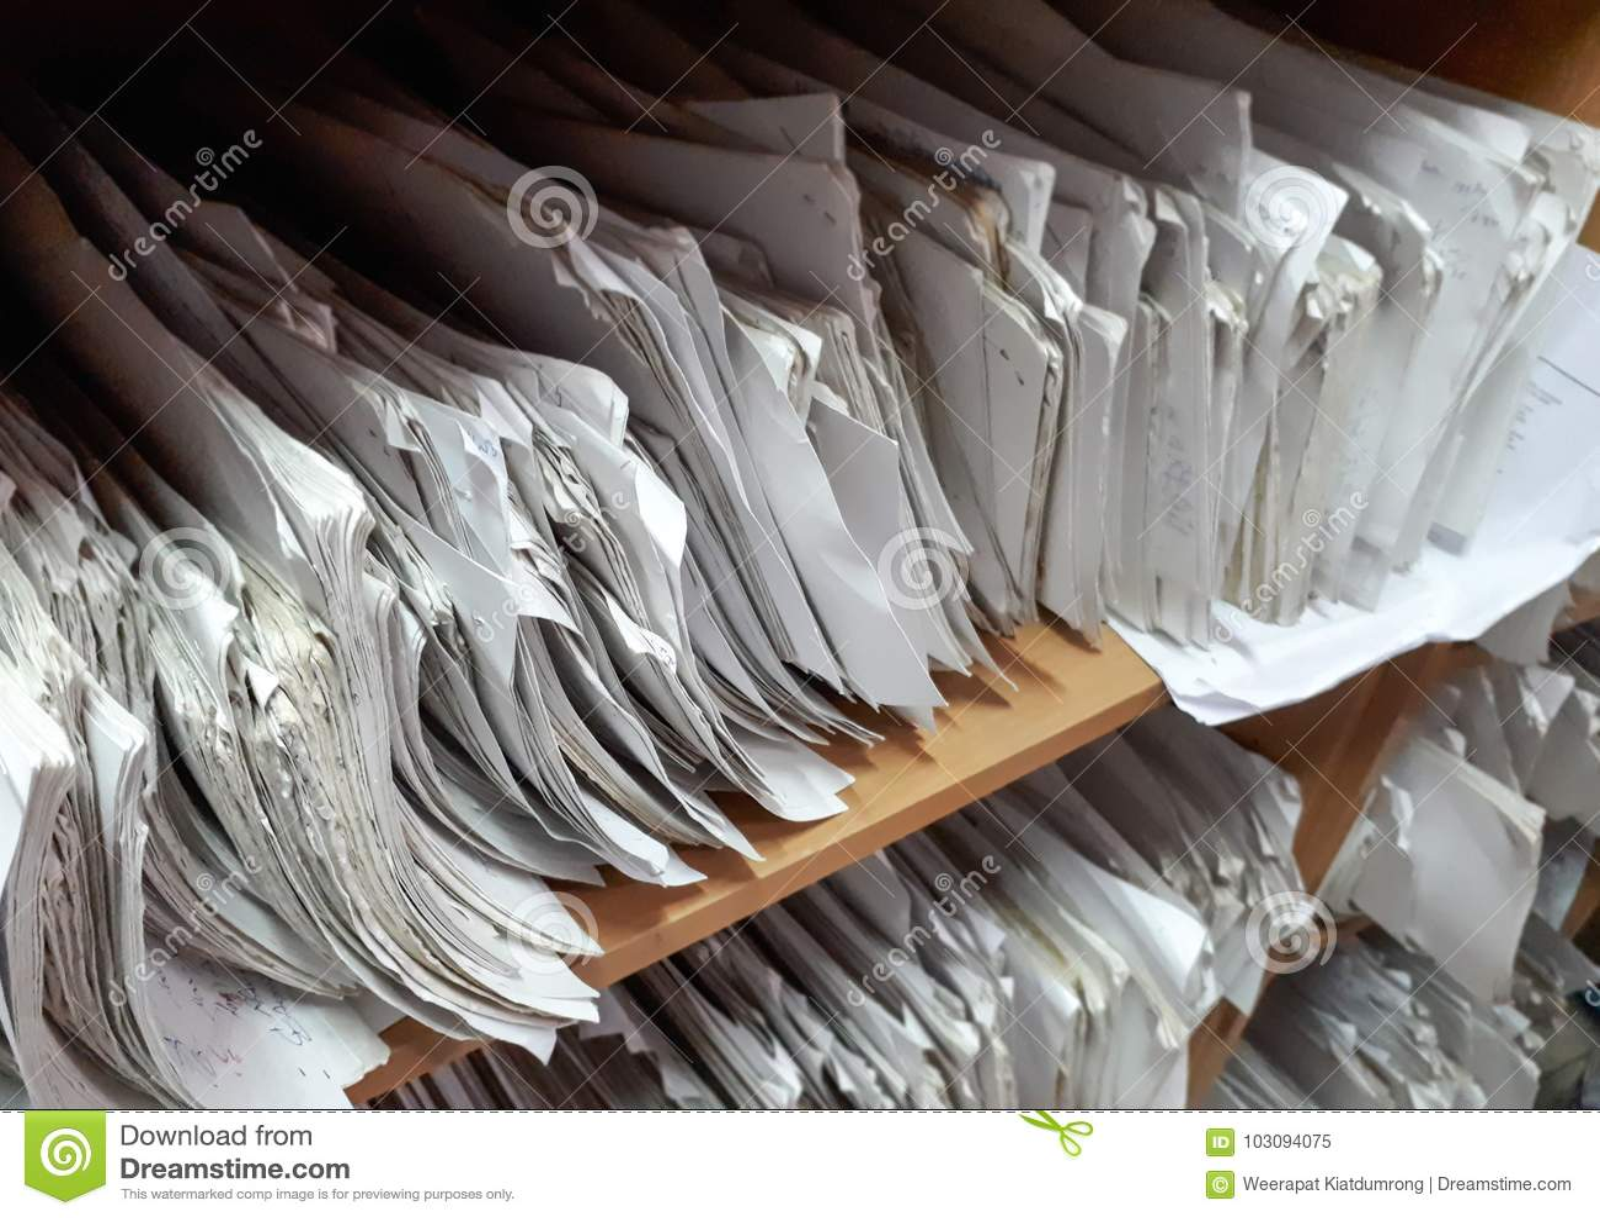 A cupboard full of paper files